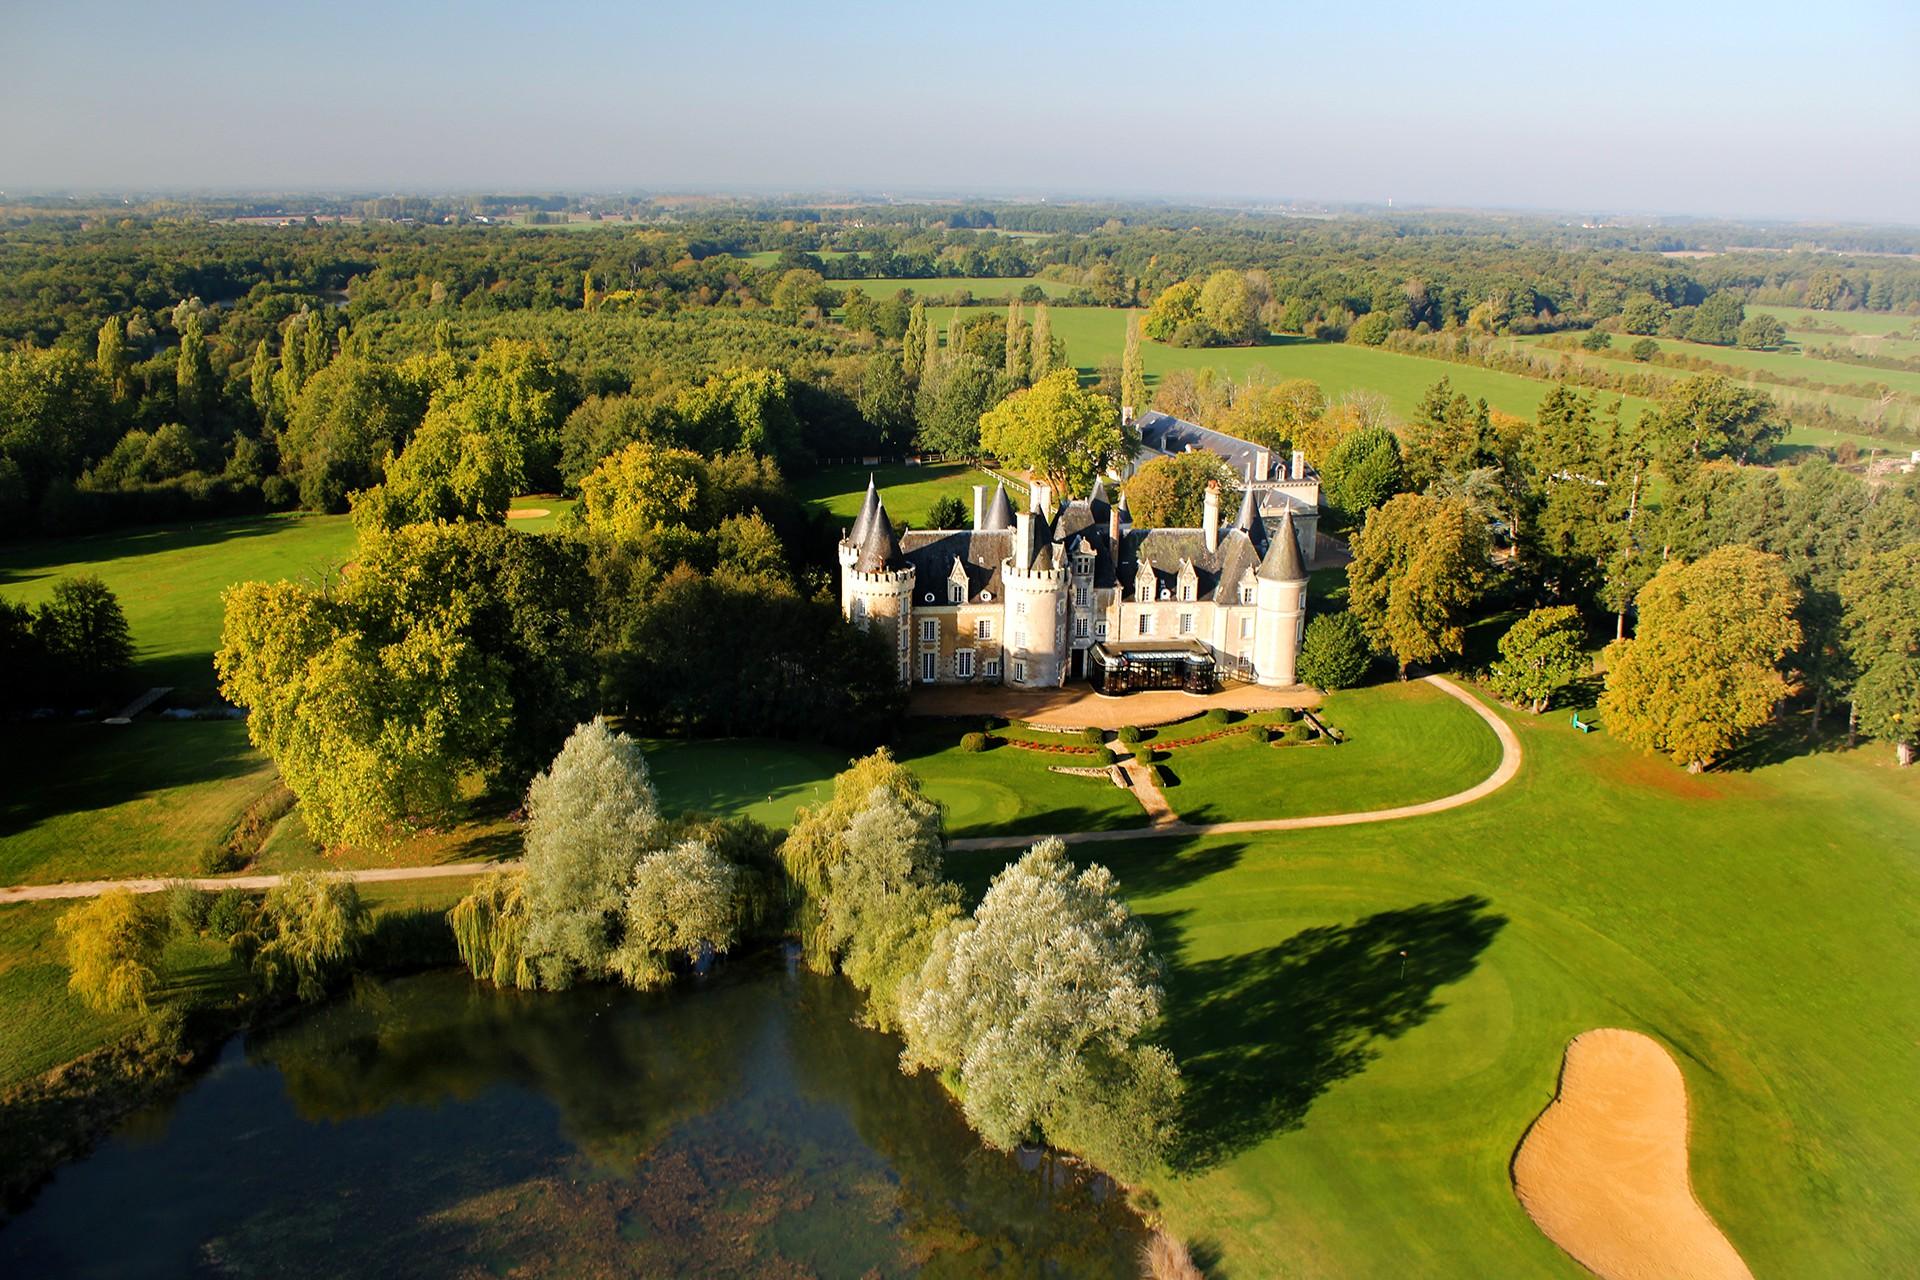 Golf De Tours Ardree - Video A U00e9rienne